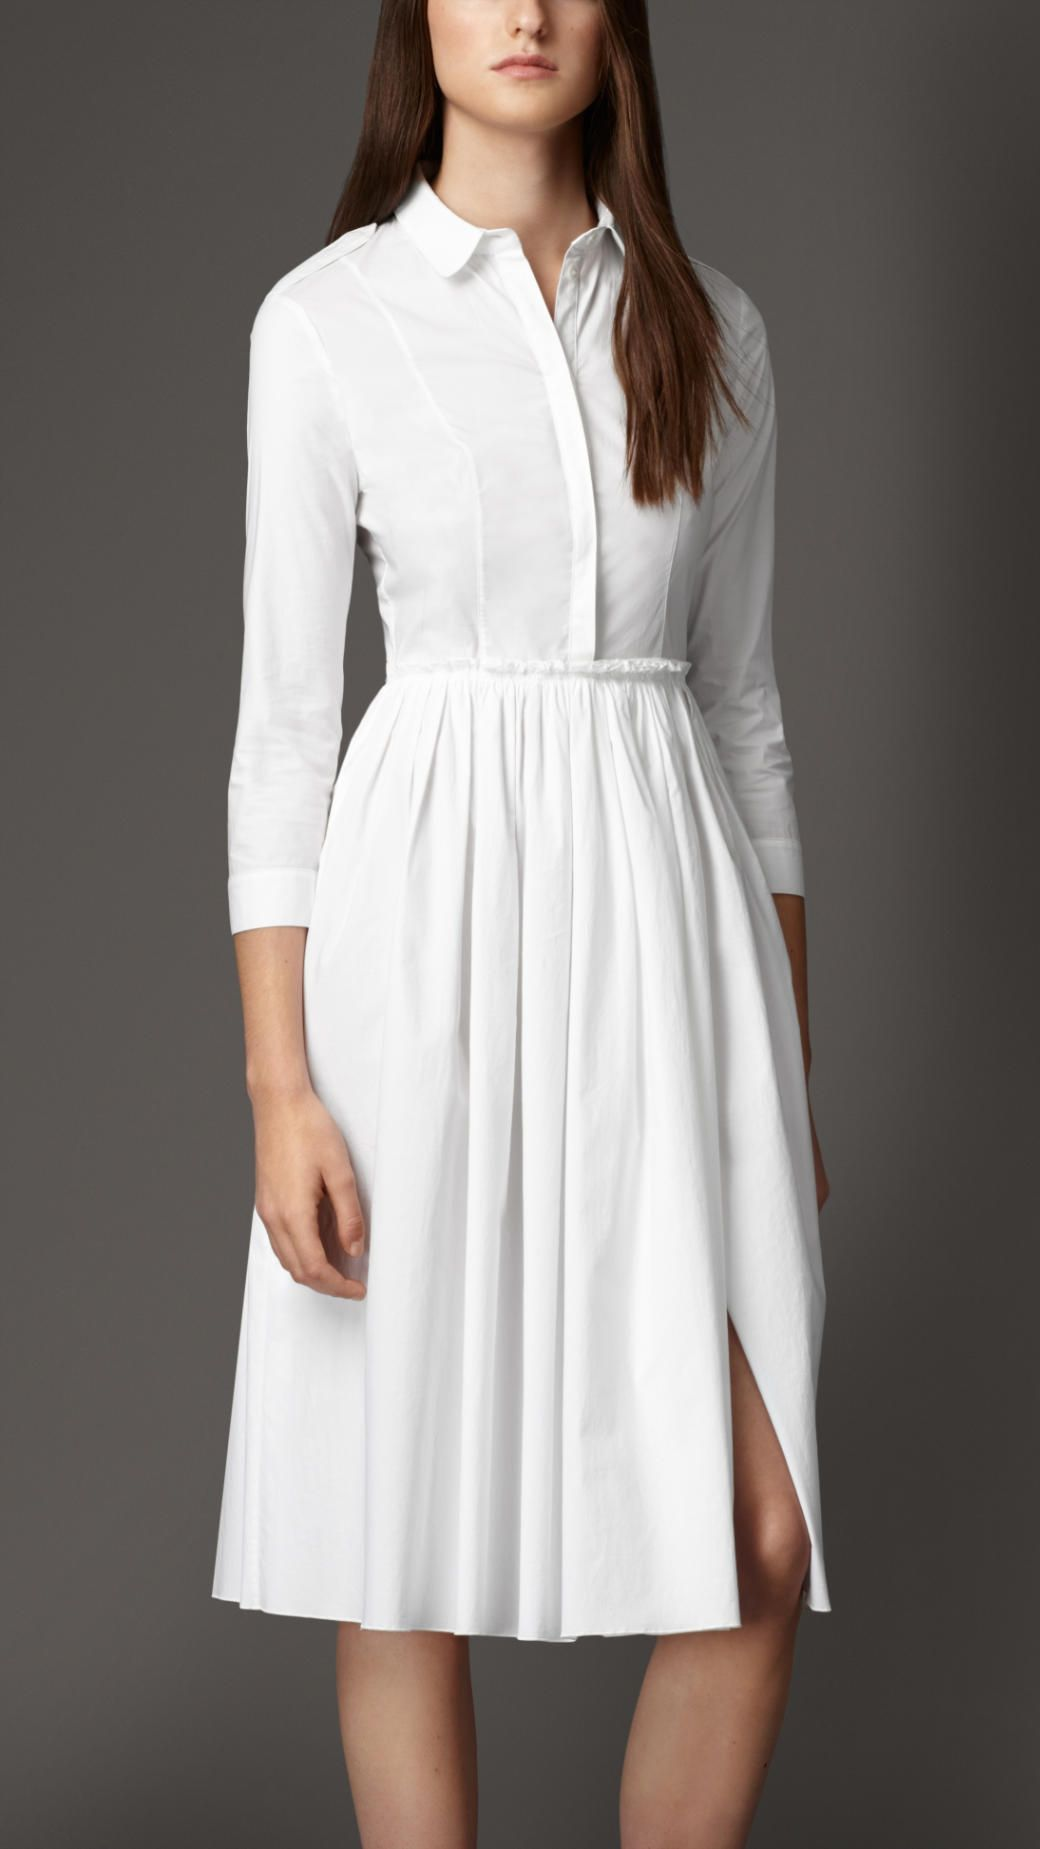 Womens Dresses Sale Burberry Wedding Gown Dresses Cotton